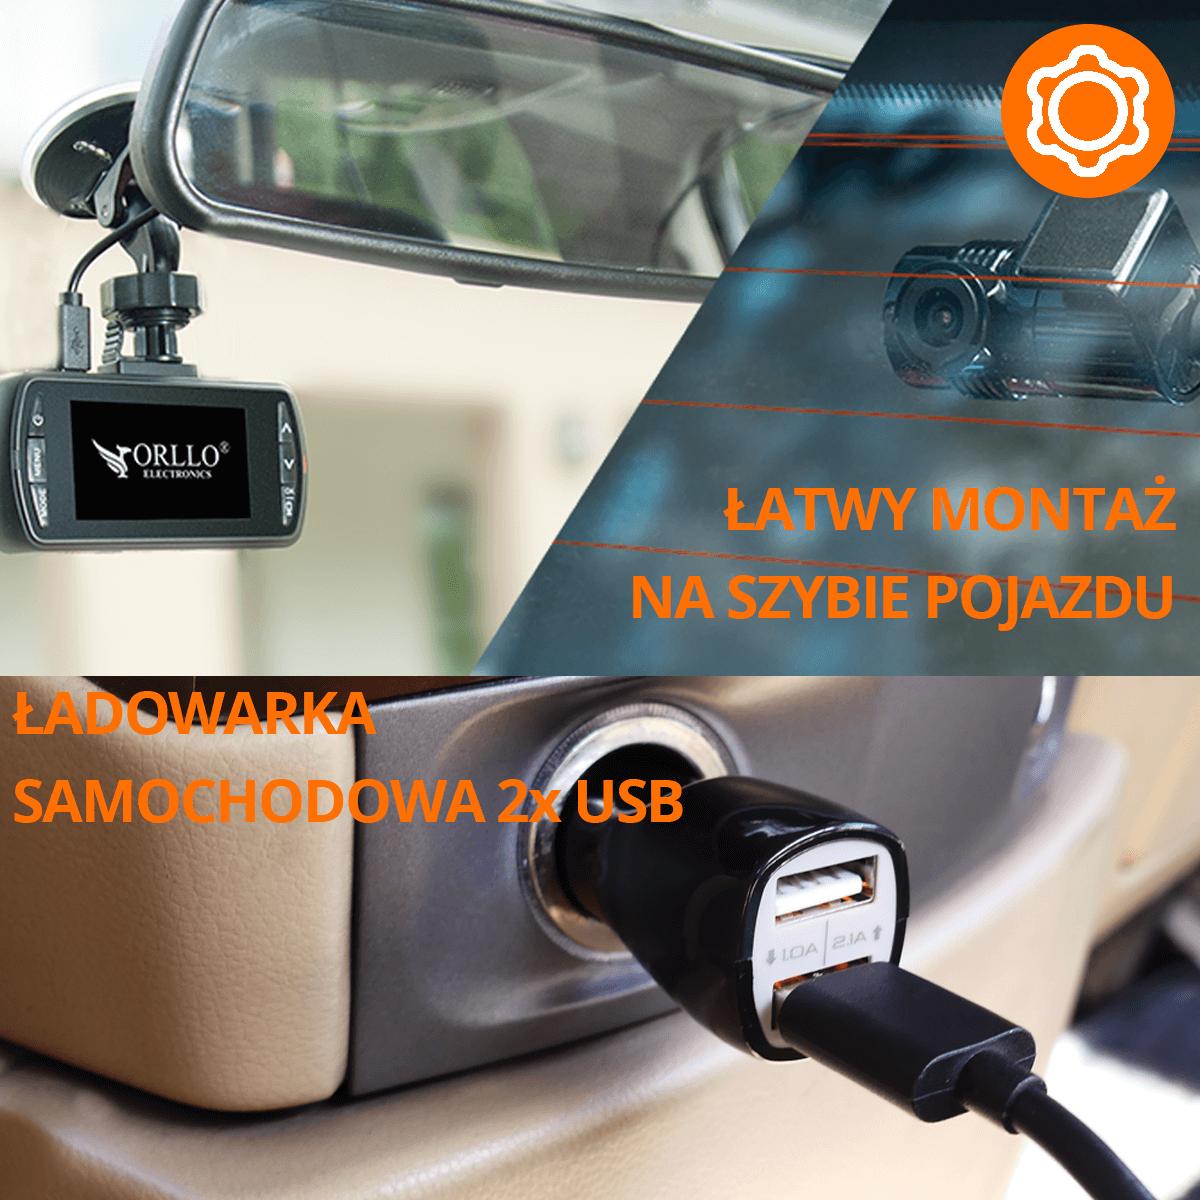 kamerka-samochodowa-USB-montaż-orllo-pl